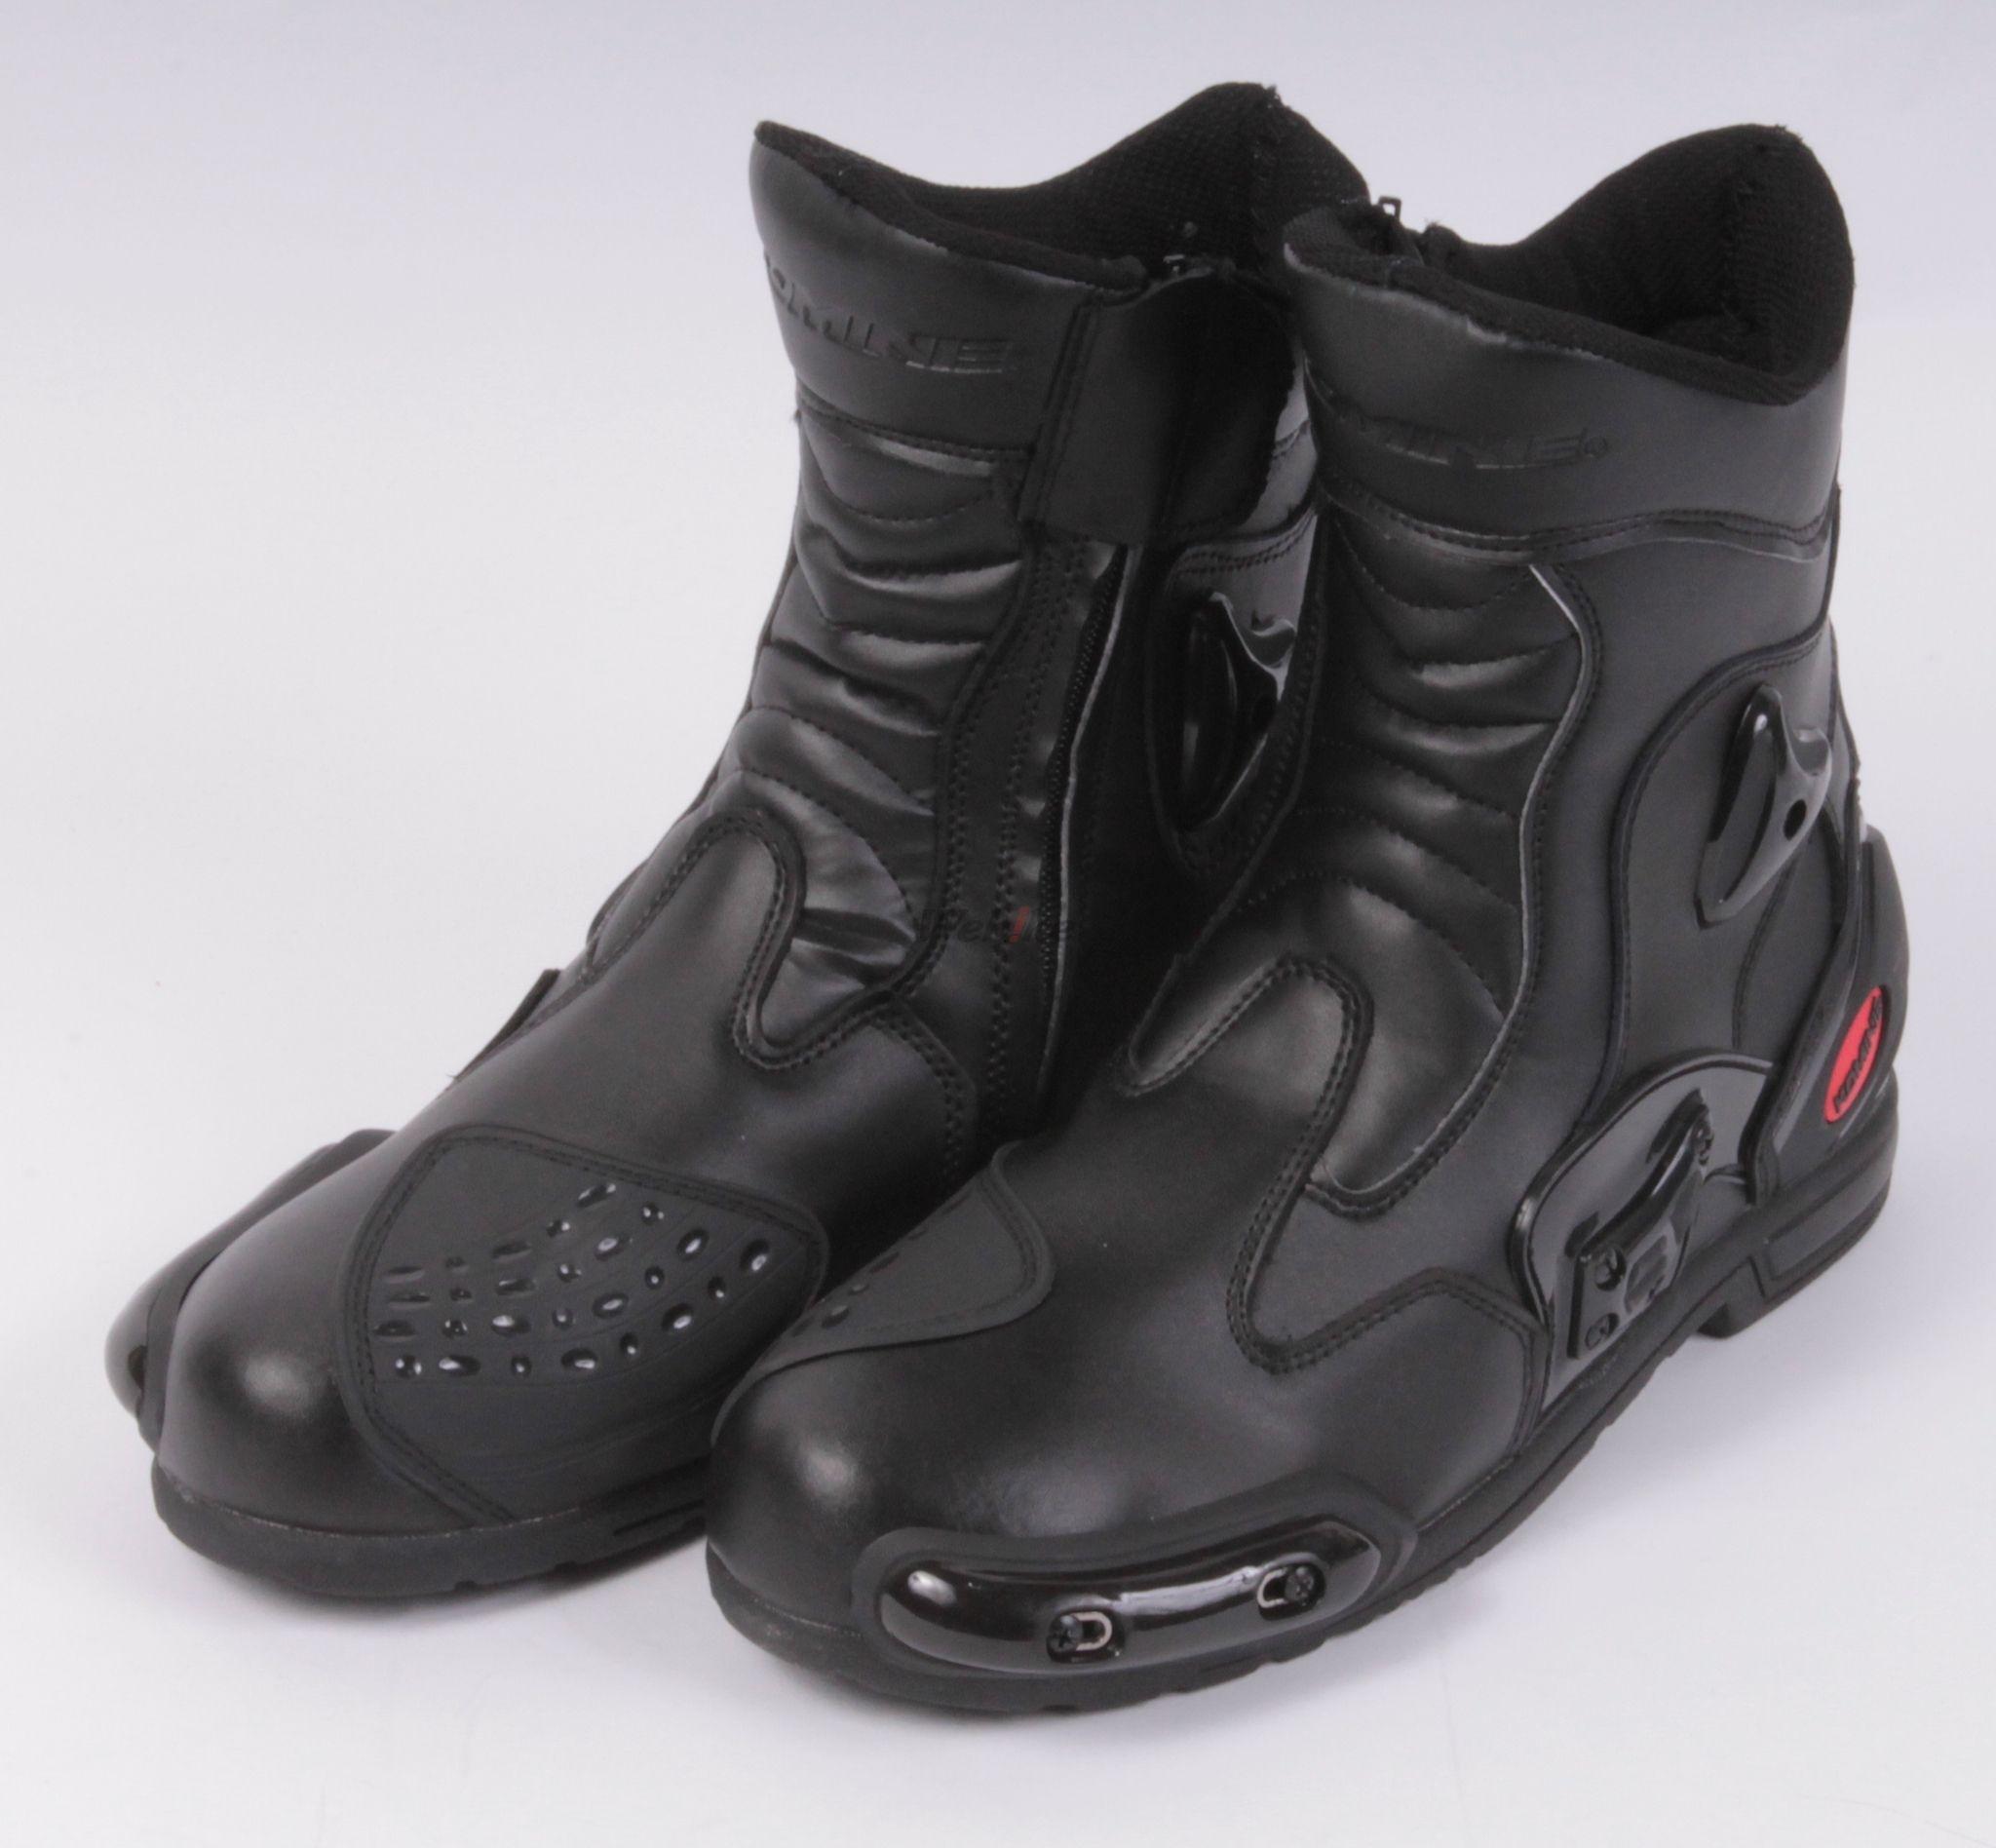 【KOMINE】BK-067 防護運動型短版騎士鞋 - 「Webike-摩托百貨」